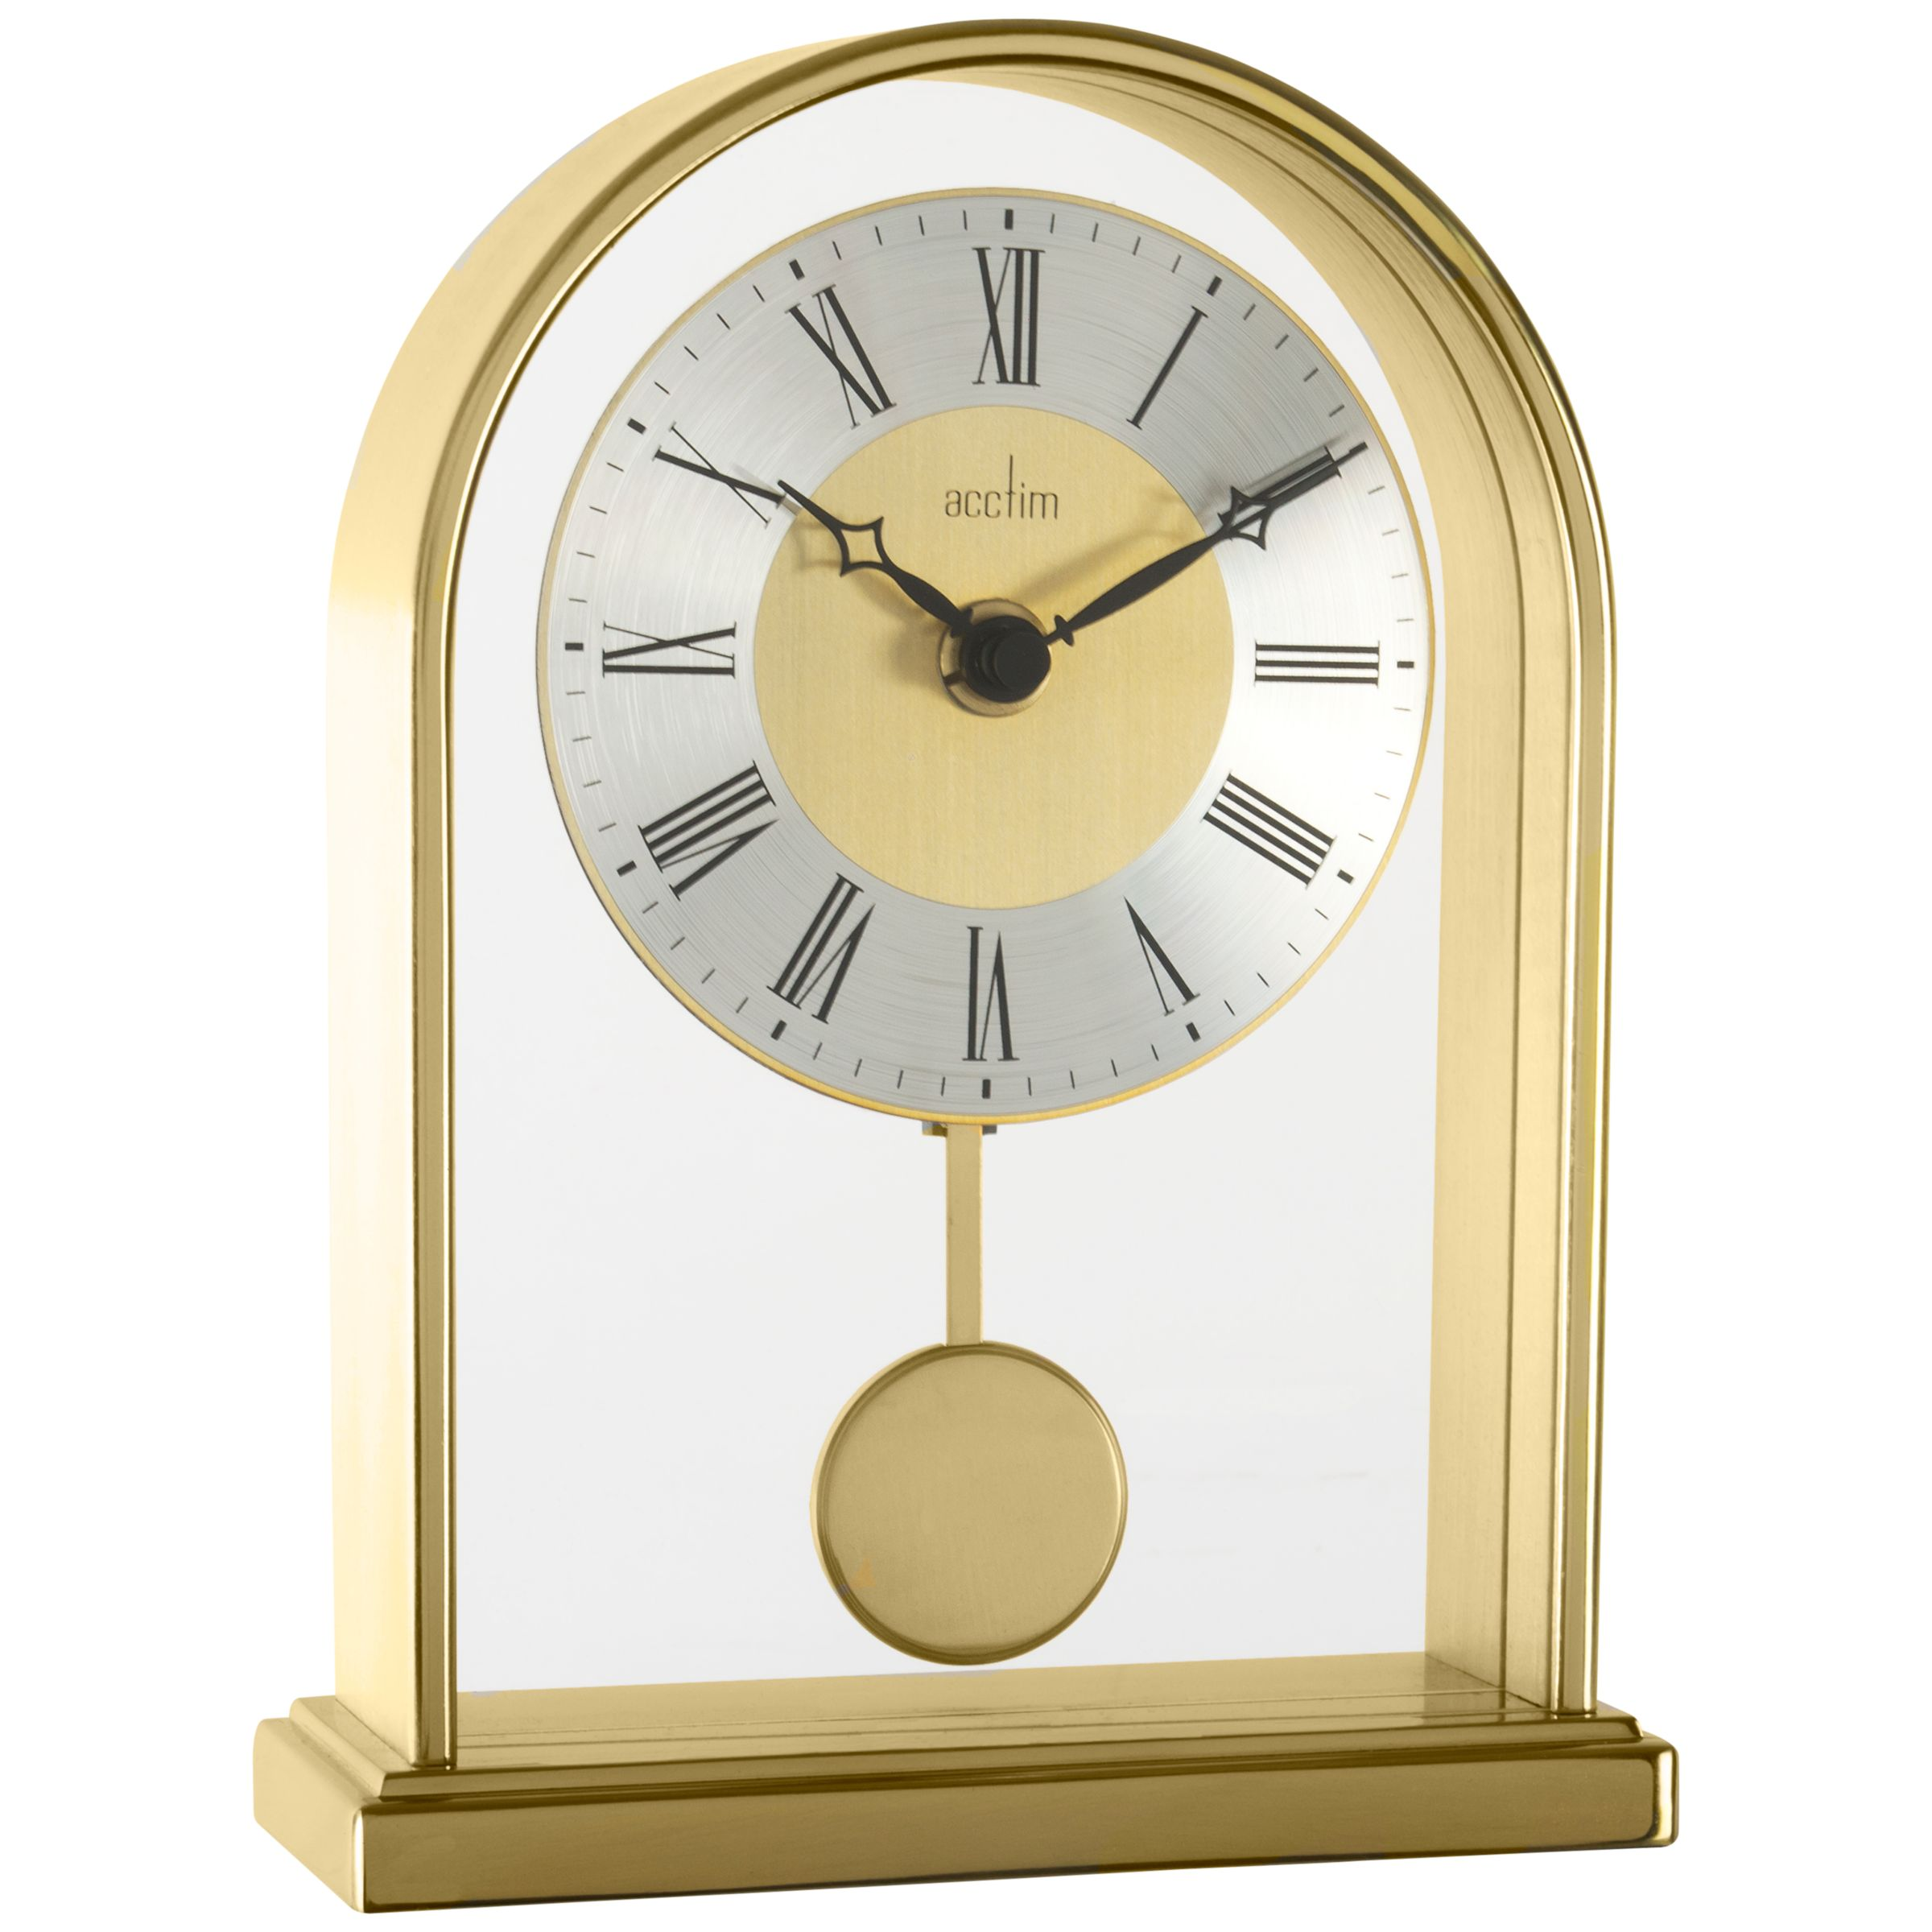 Acctim Acctim Thurrock Mantel Clock, Gold